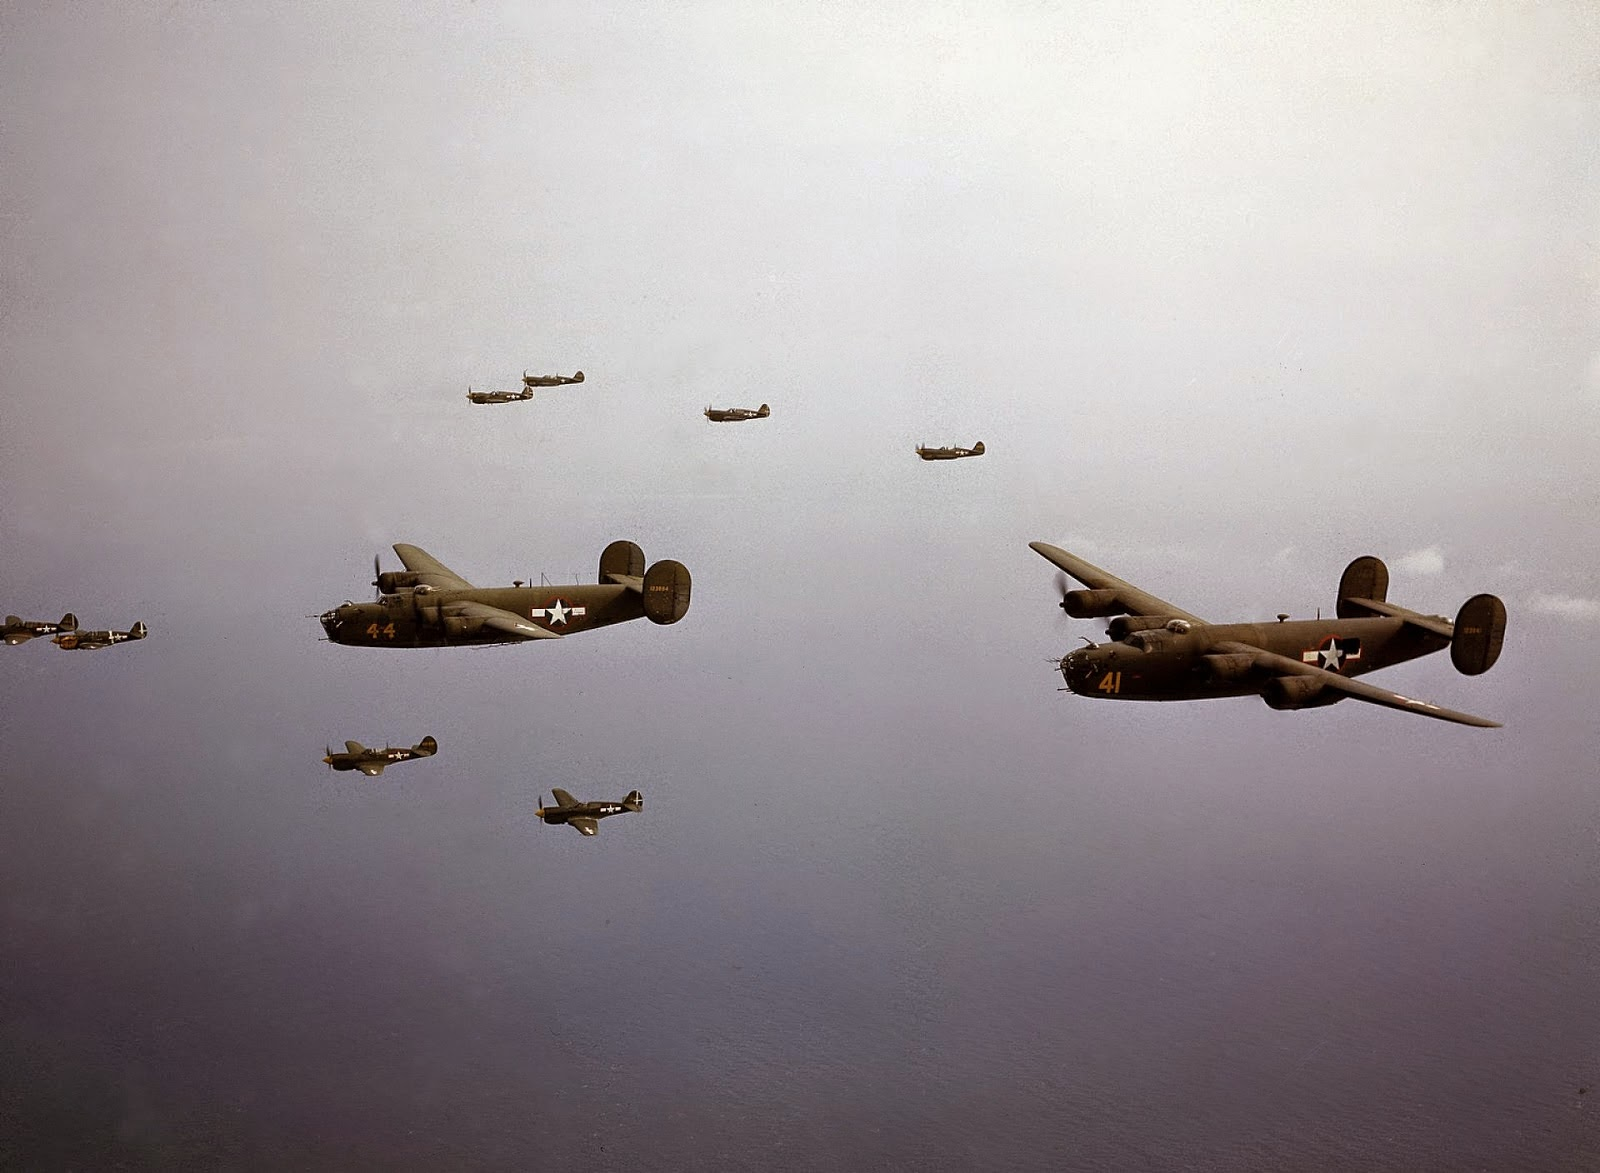 http://3.bp.blogspot.com/-1v3uUe2SwEU/VLacGubStlI/AAAAAAABOMA/g_xdI0UOgx4/s1600/Rare+Color+Photographs+from+World+War+II+(3).jpg